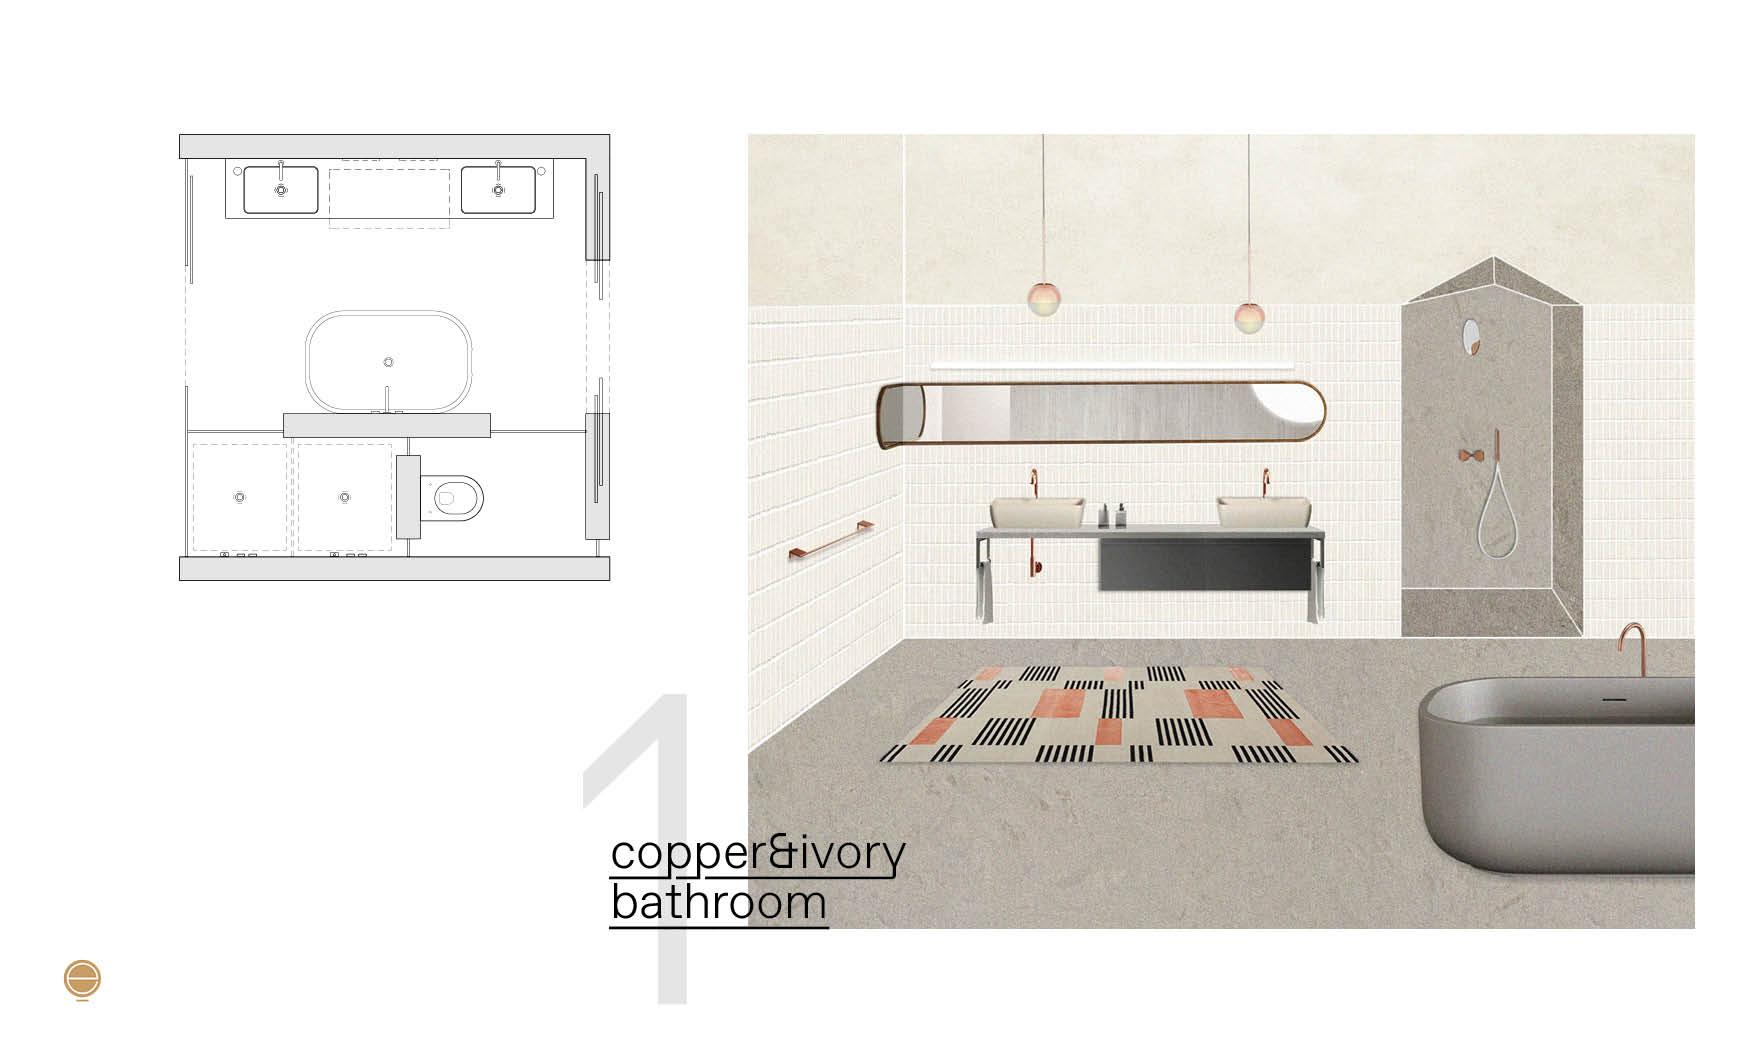 Modern Italian bathroom perspective in copper&ivory version and plan design by Esperiri Milano